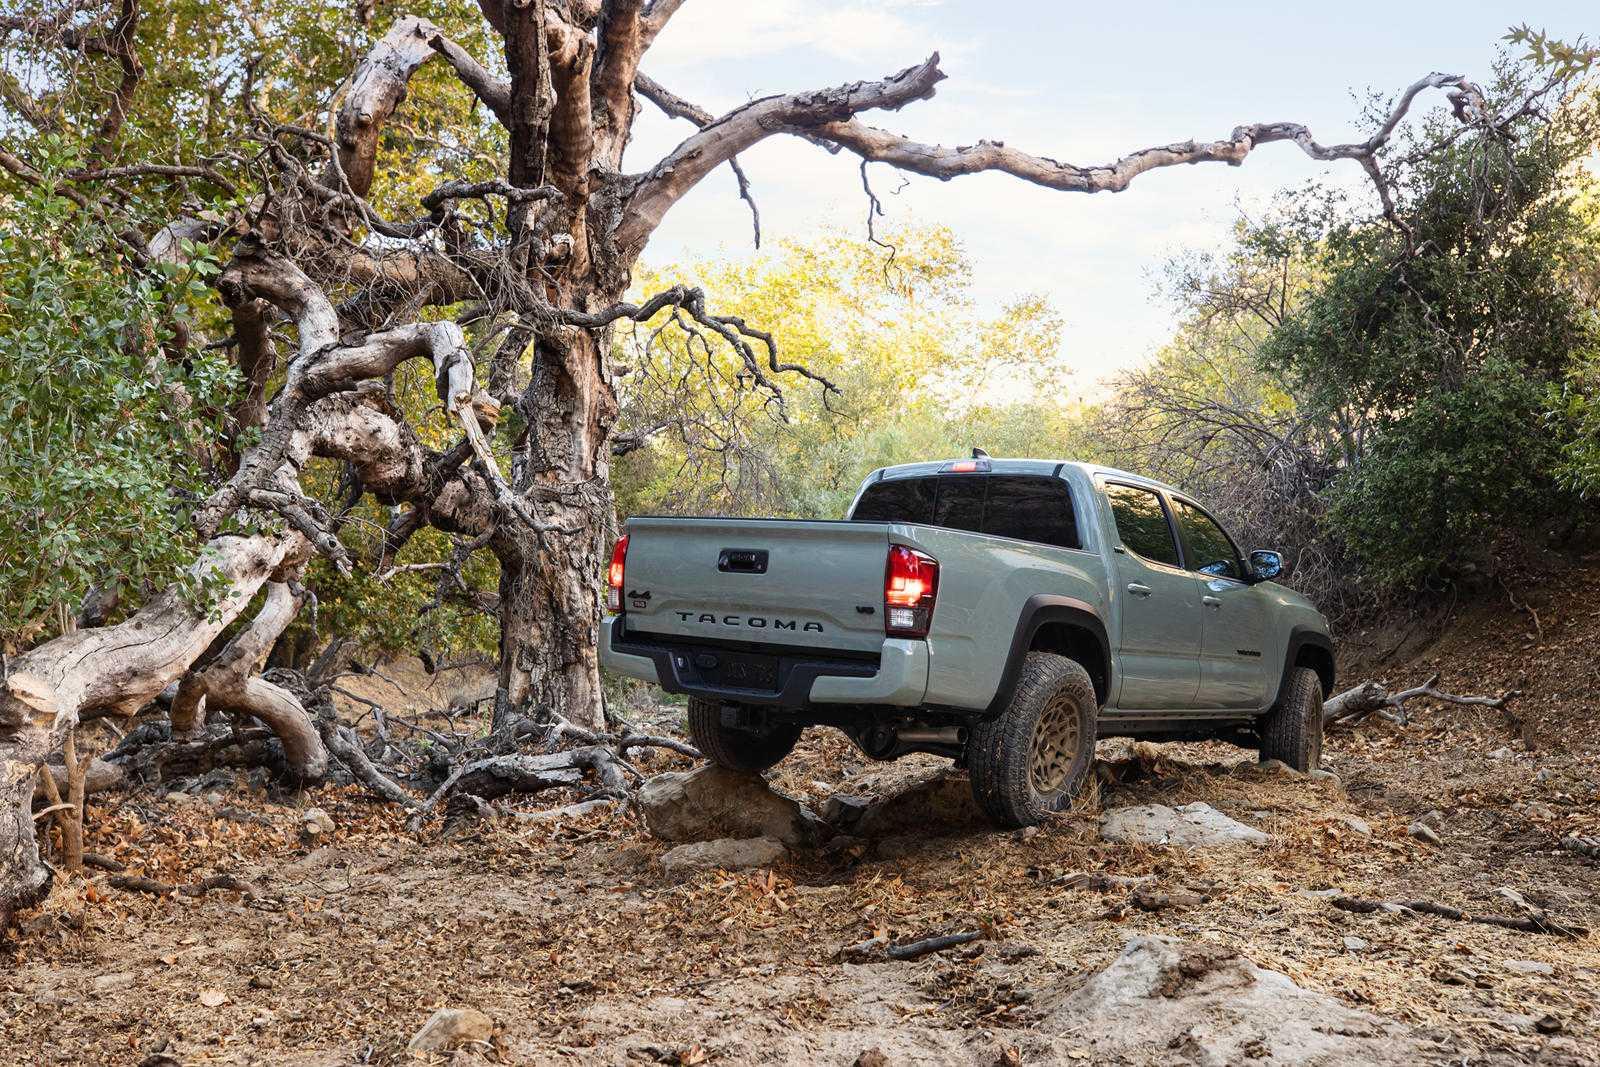 Toyota-Tacoma-Trail-Edition-bán-tải-off-road-giá-rẻ (1).jpg